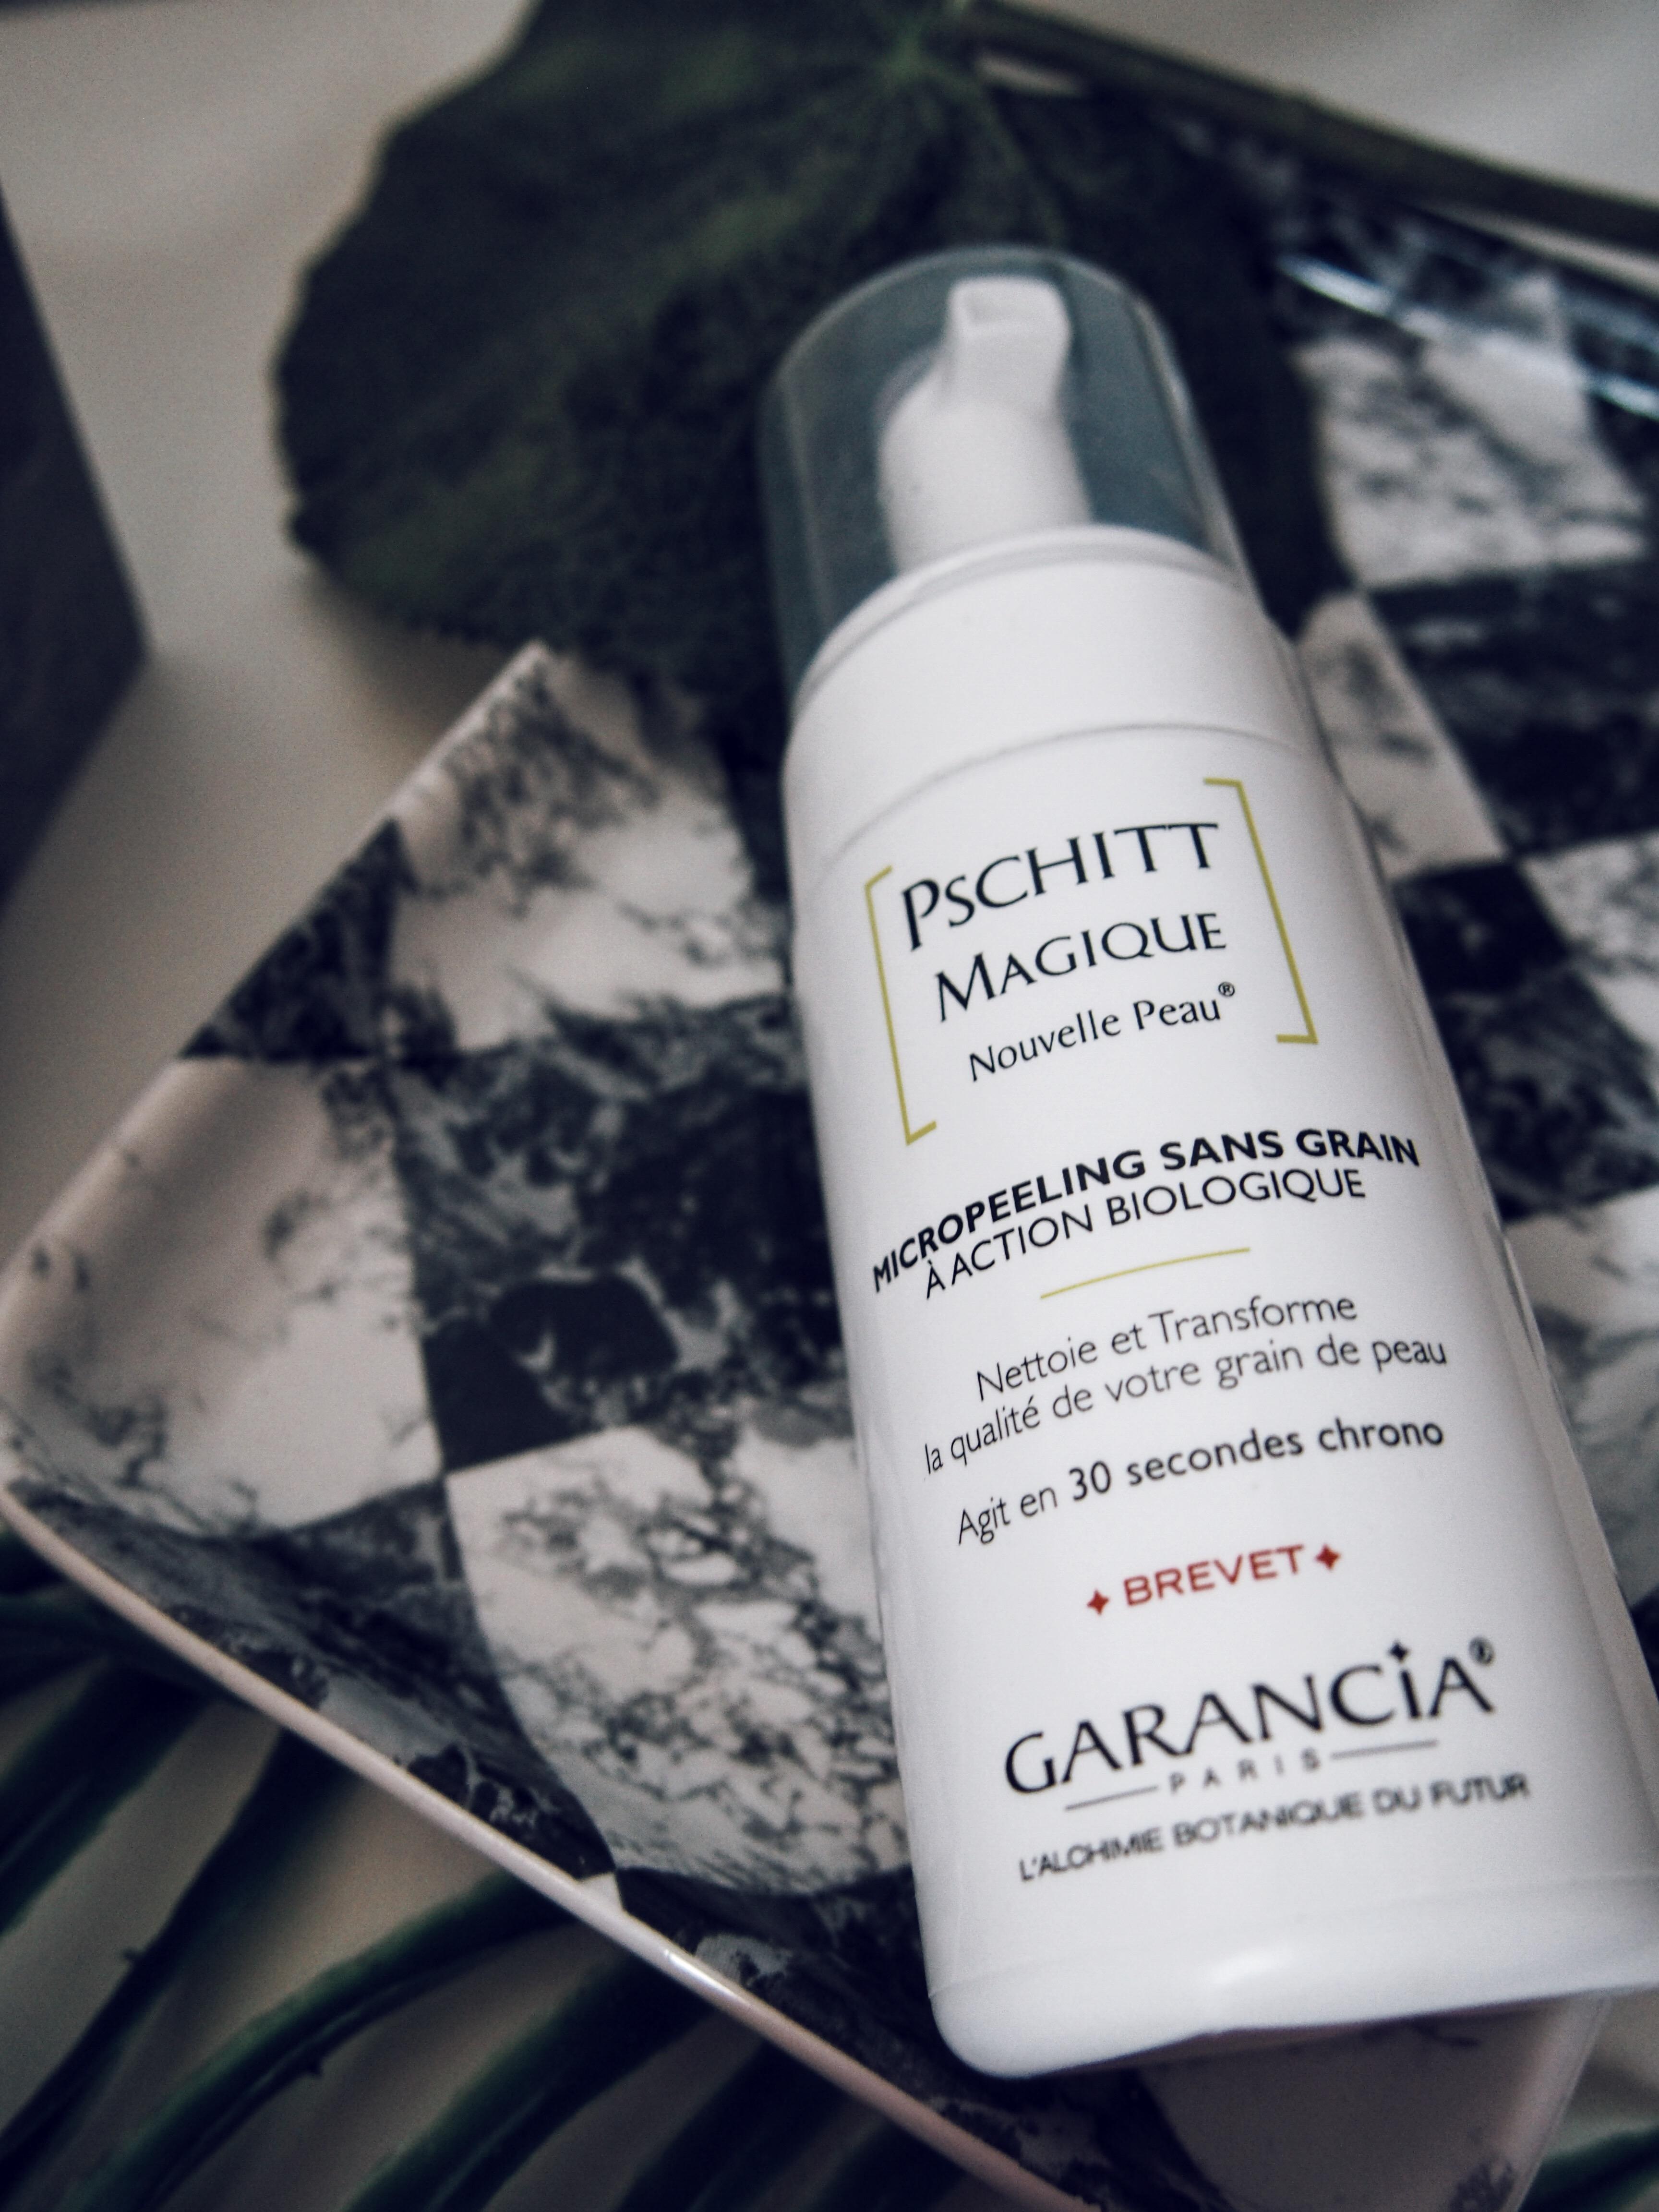 garancia-cosmetique-beaute-soprettylittlethings